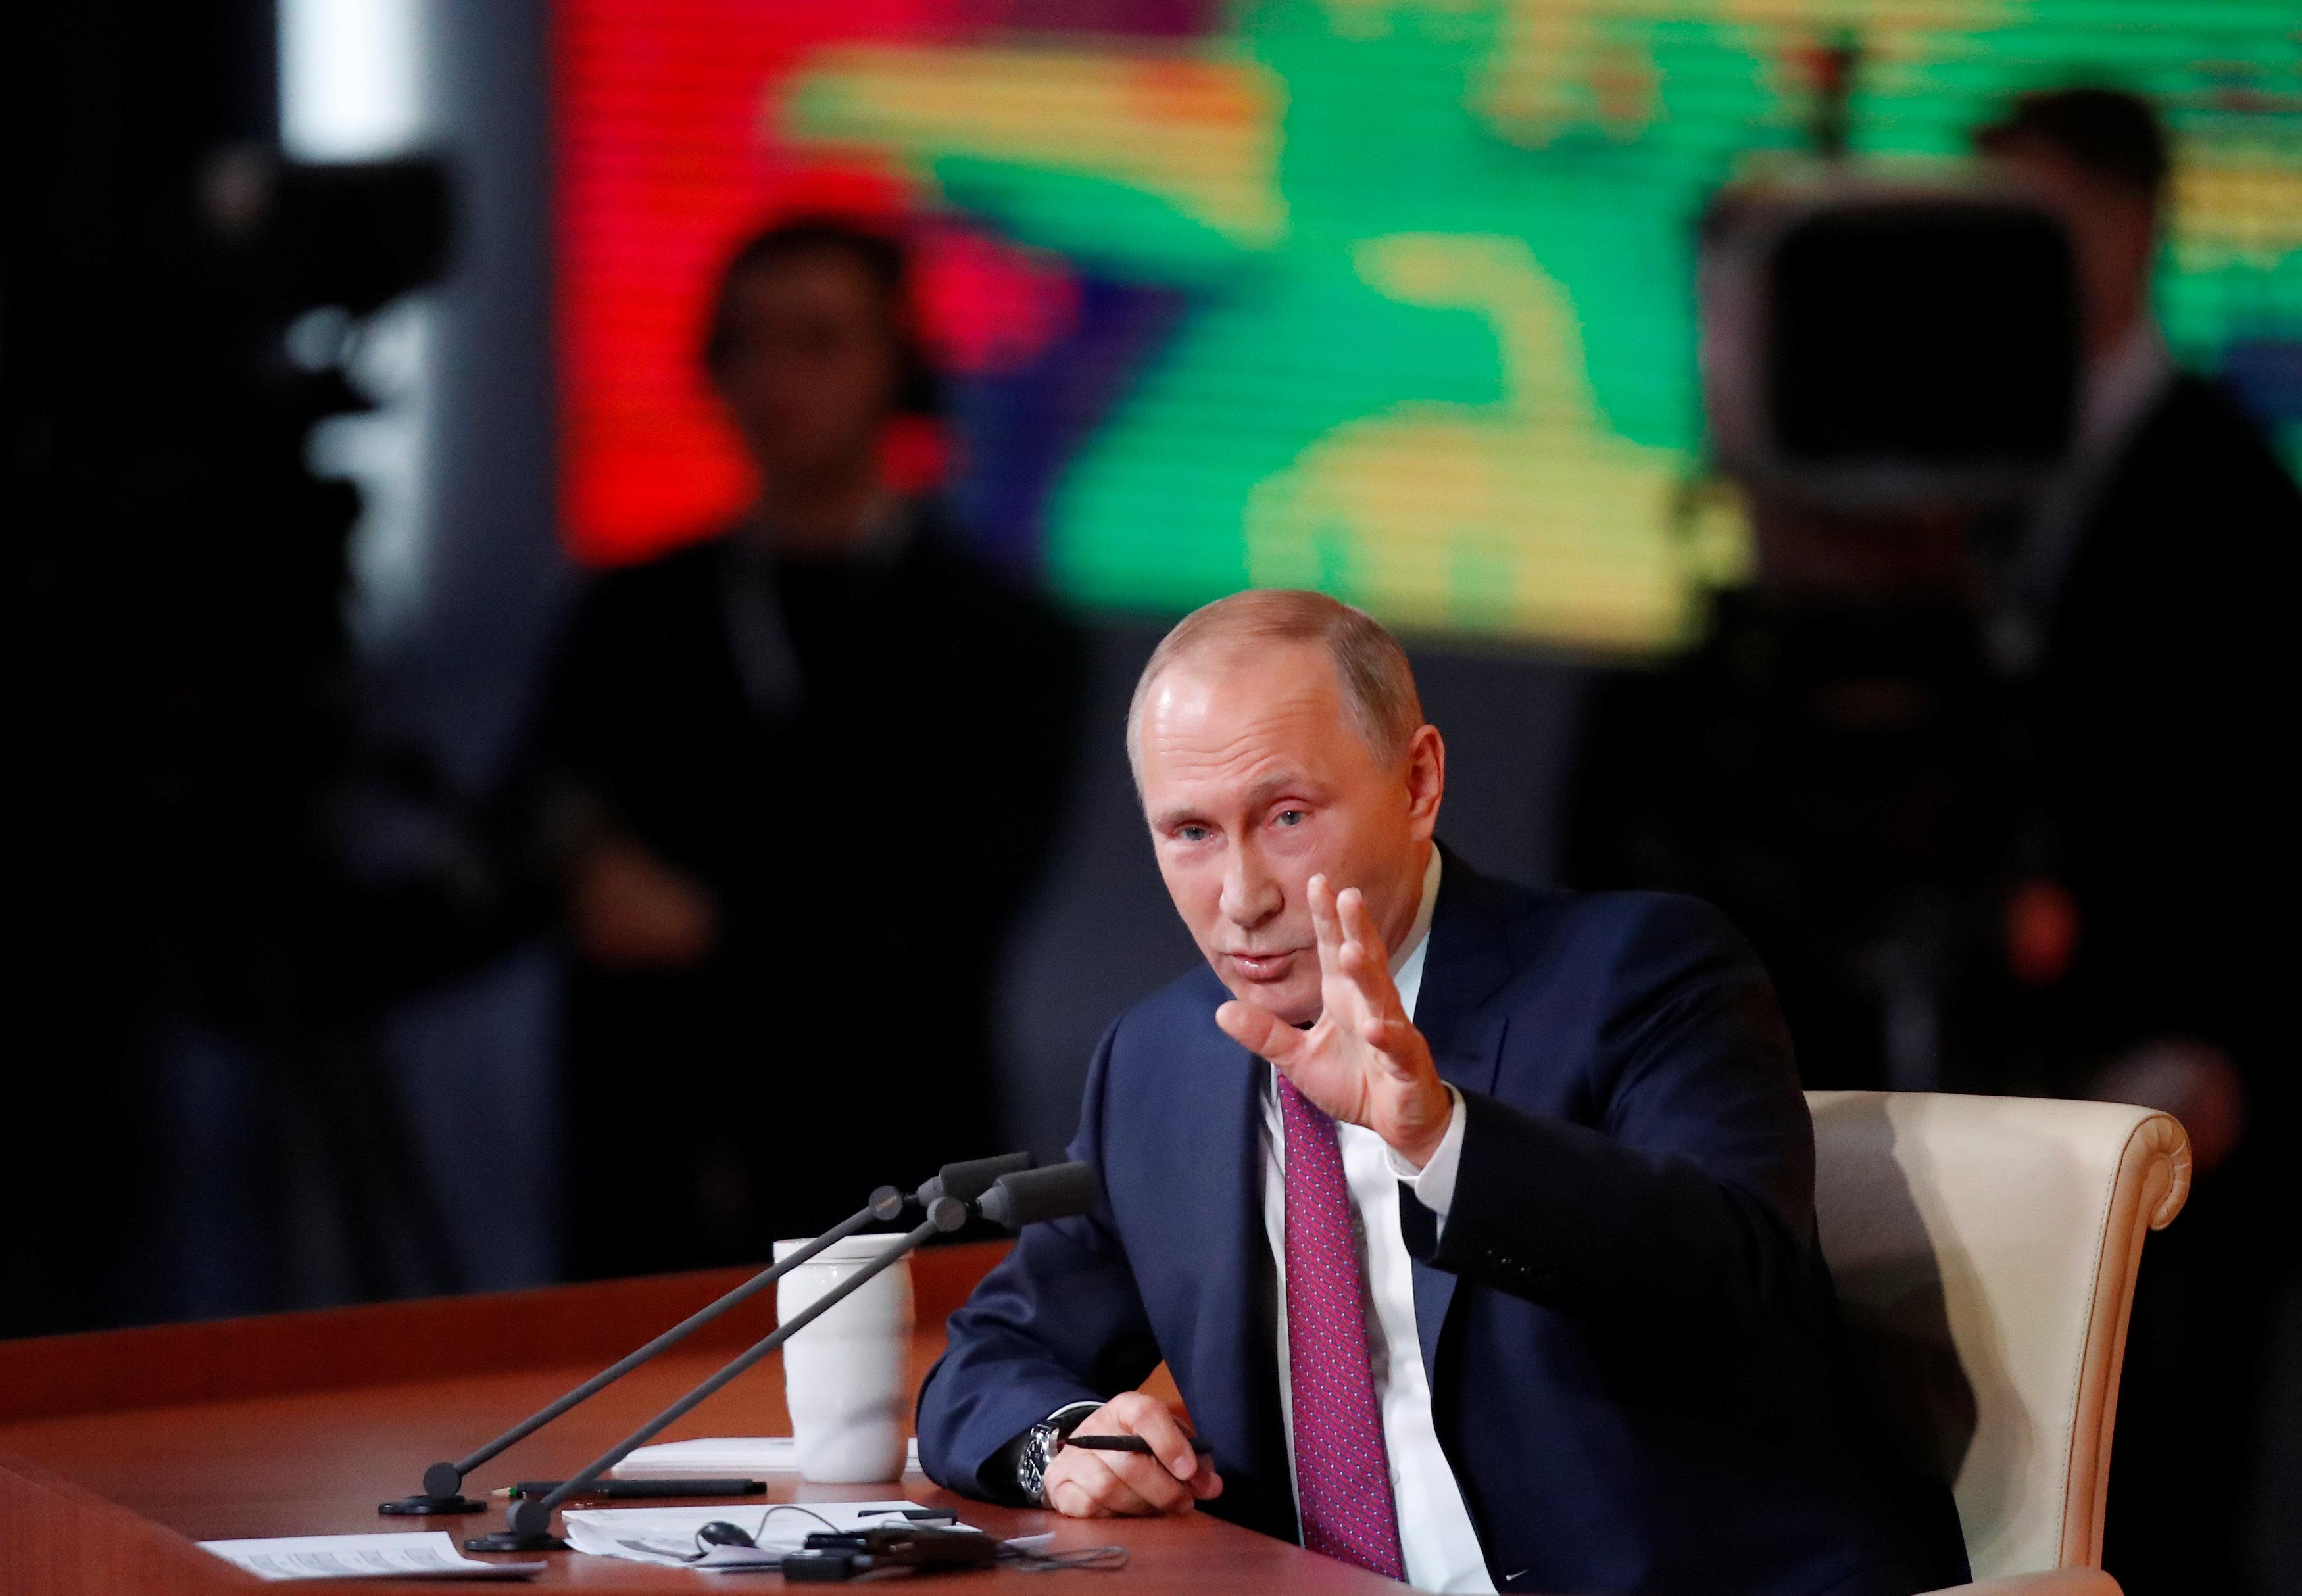 Putin says U.S. gripped by fabricated spymania, praises Trump